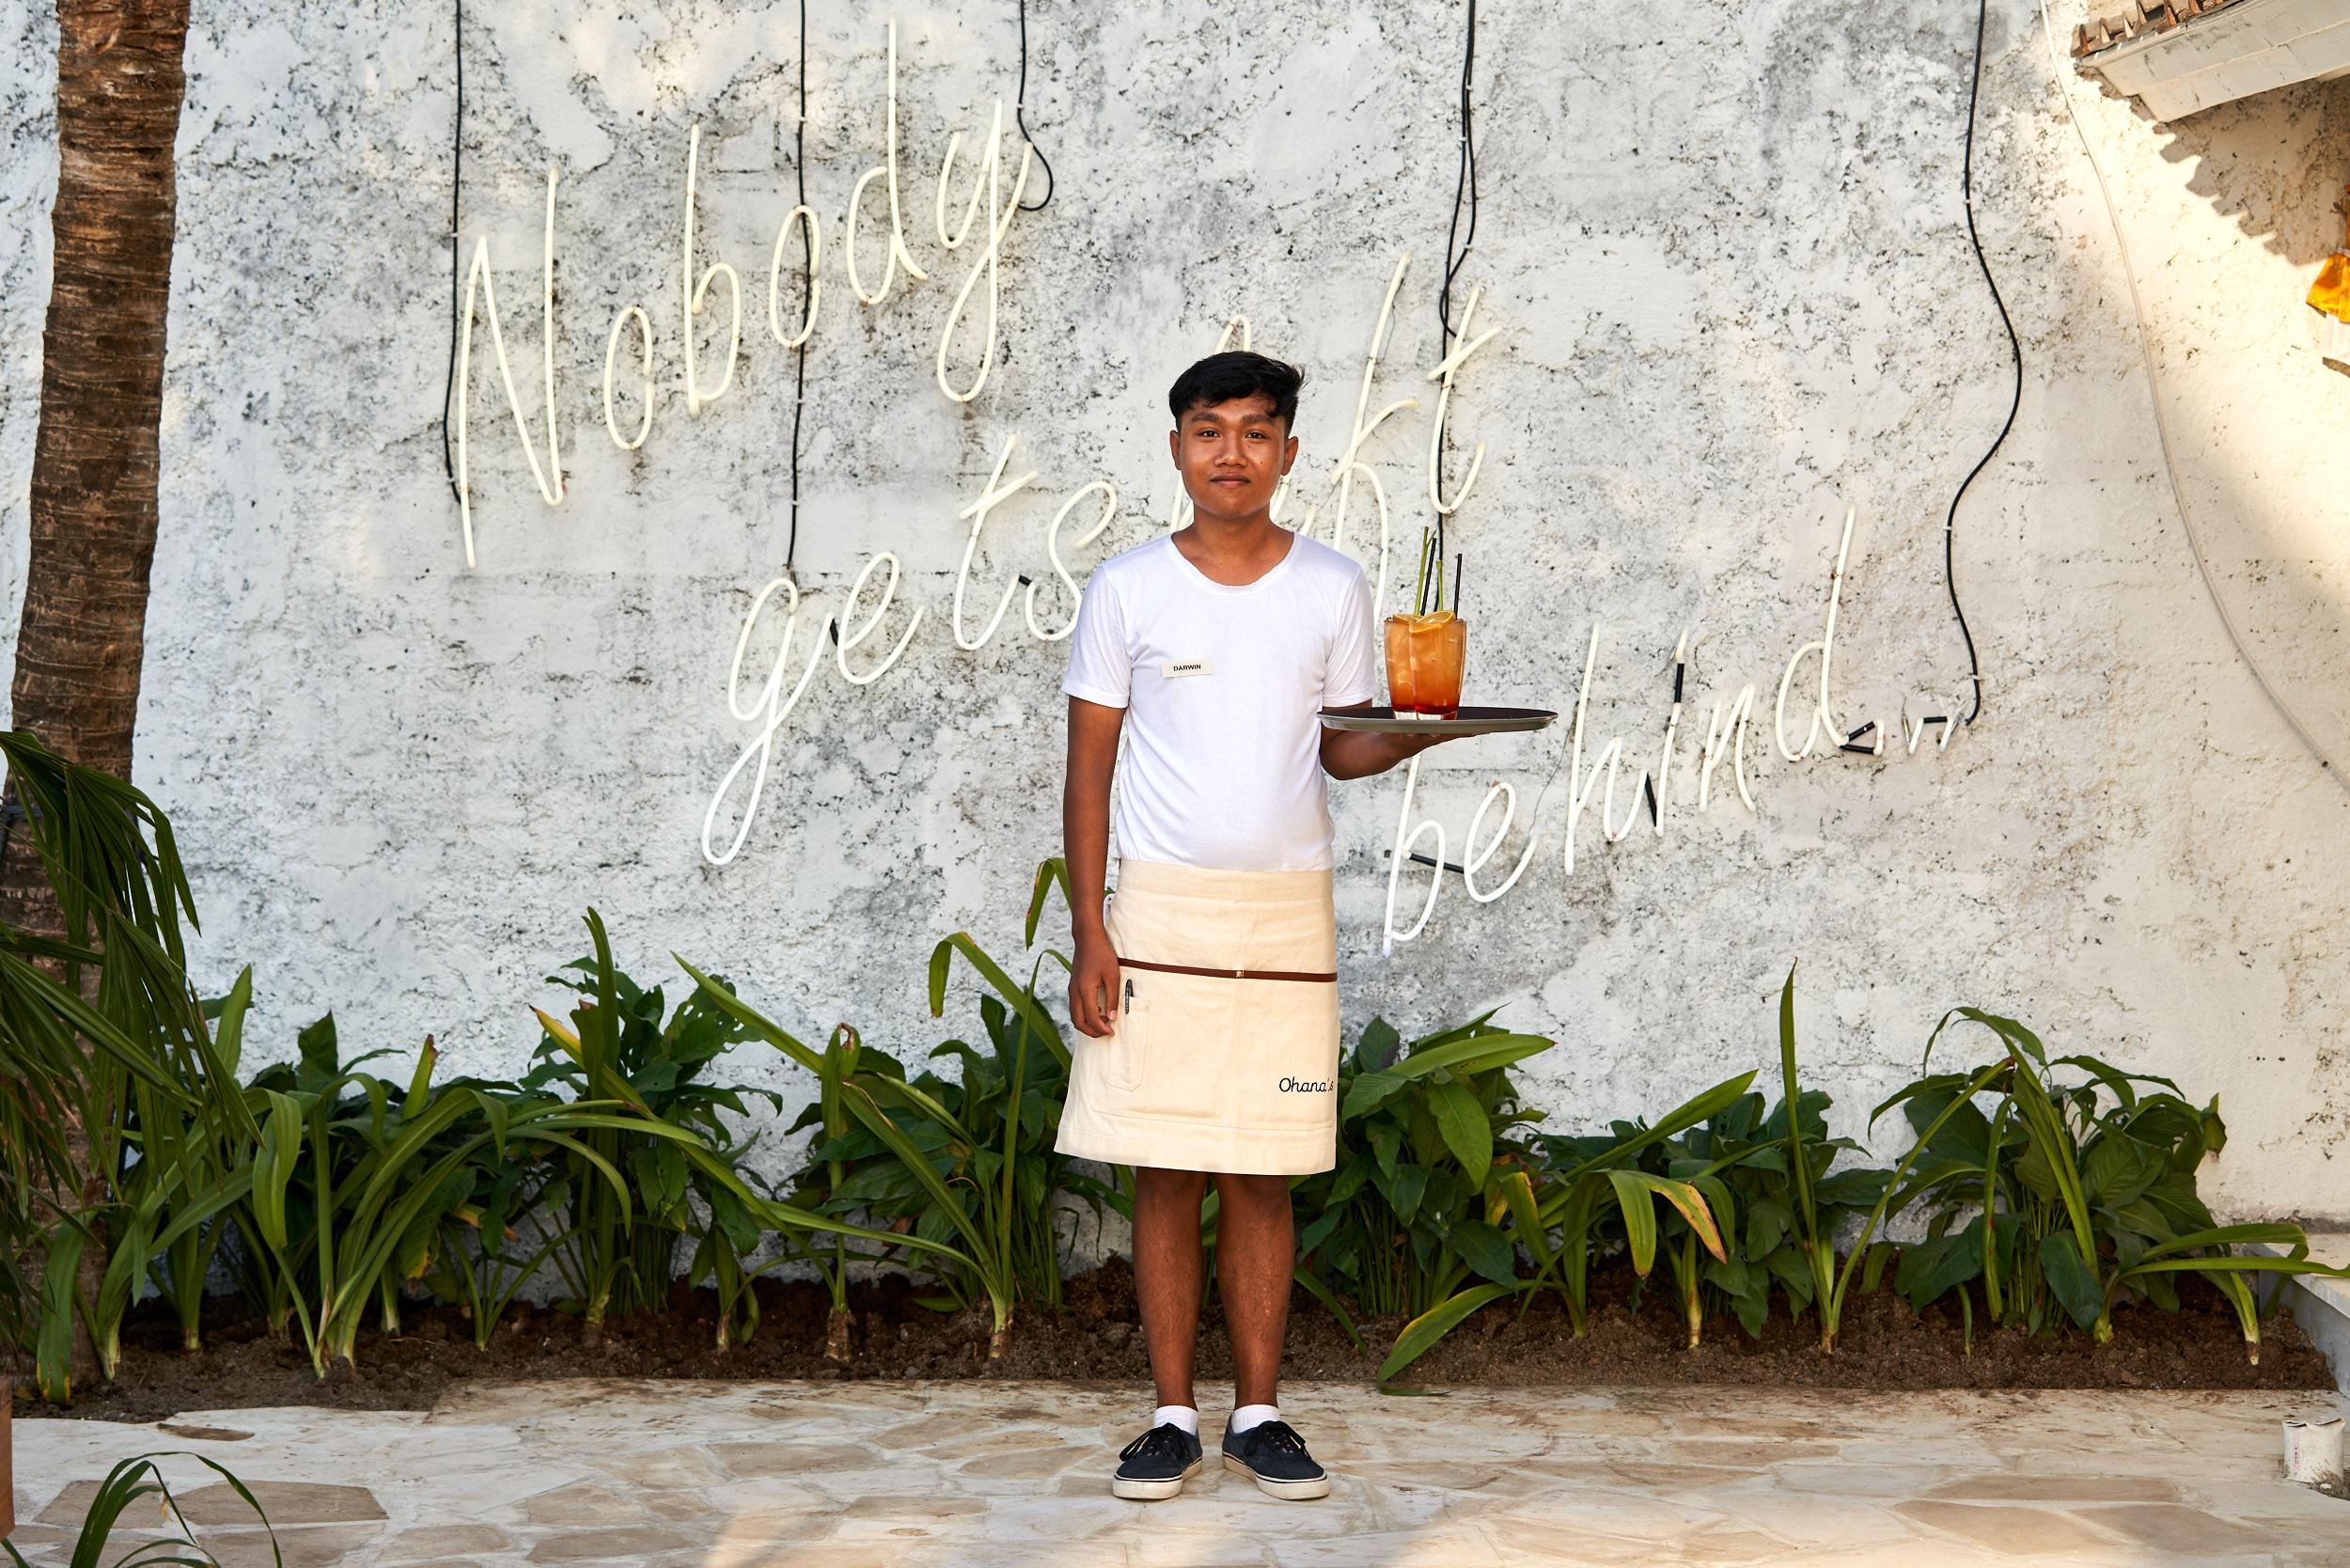 Ohana's restaurant Nusa Lembongan